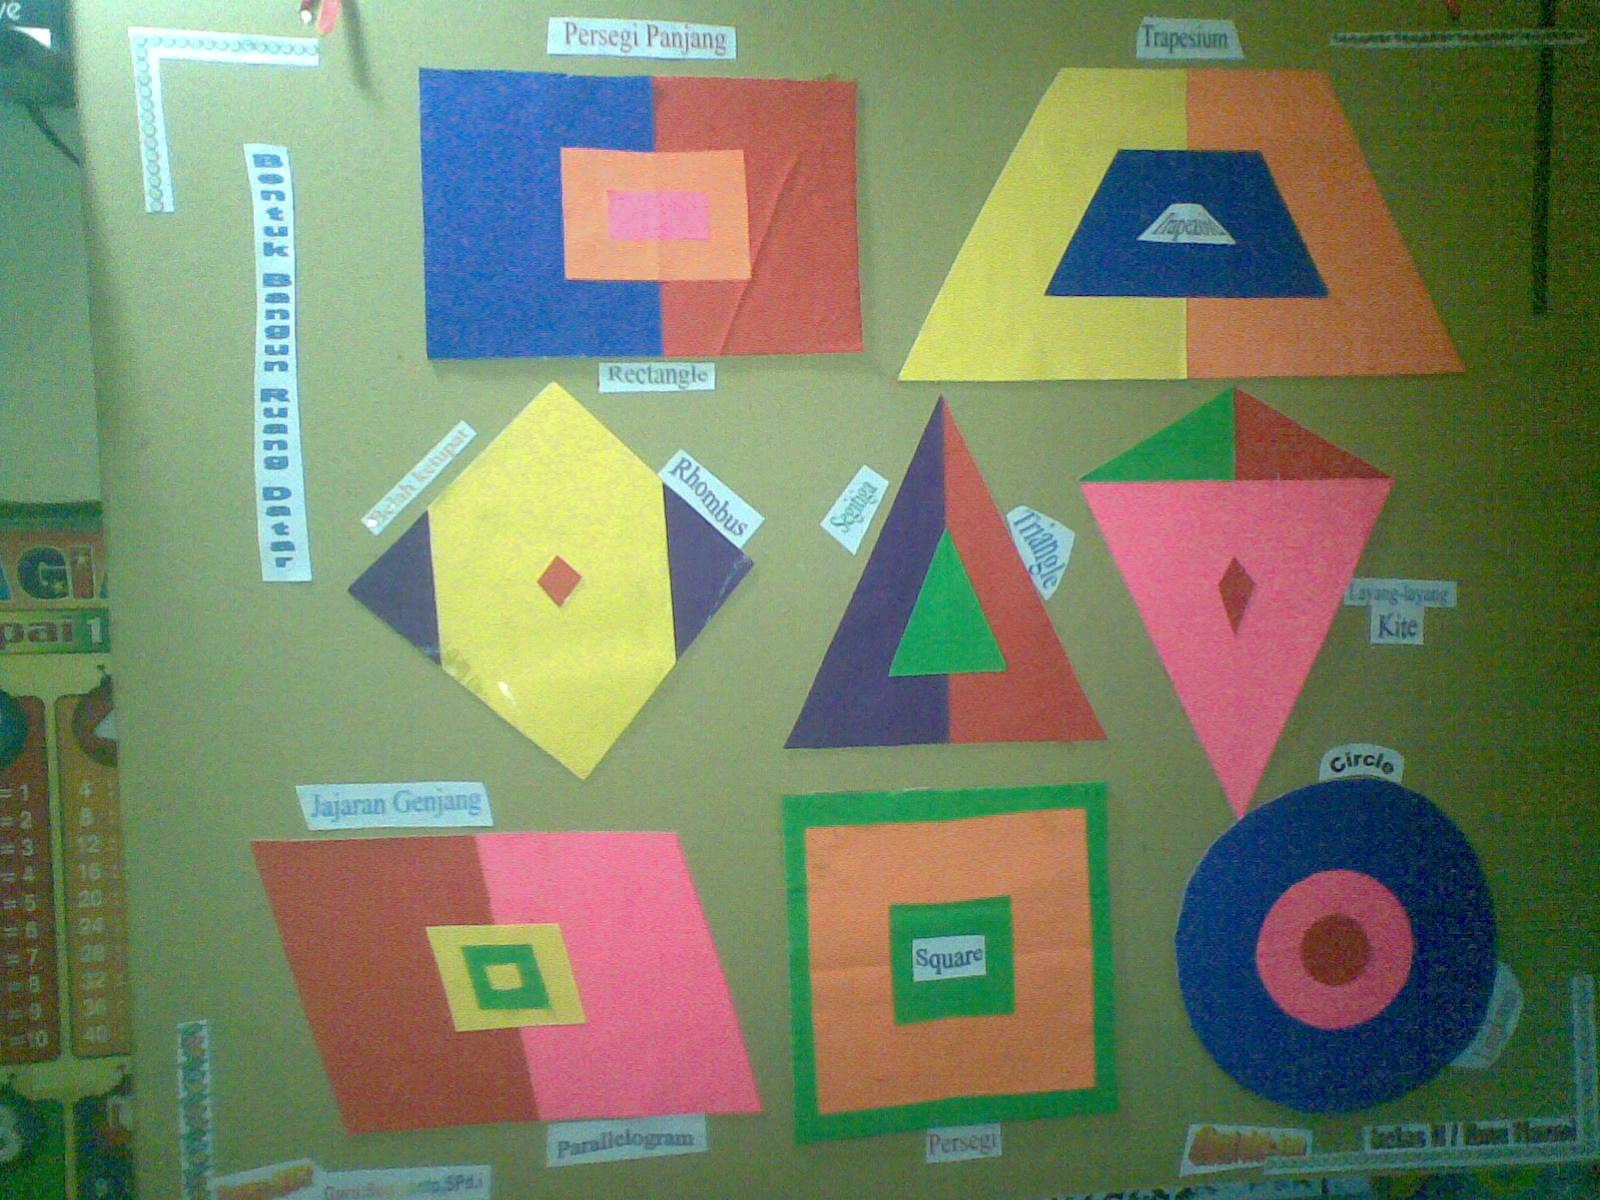 soal matematika kelas 5 sd sifat-sifat antar bangun datar